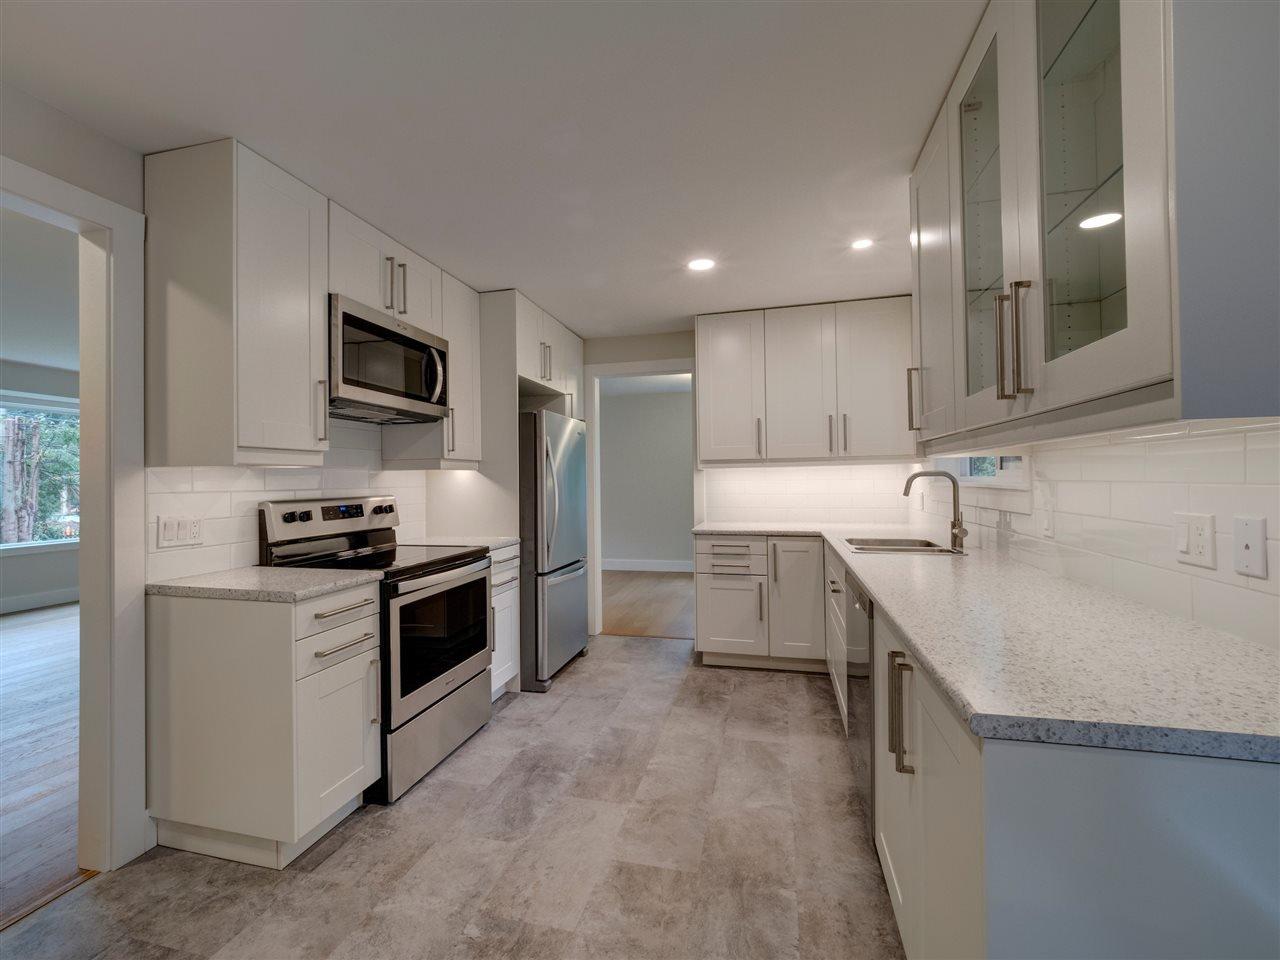 Photo 6: Photos: 1085 ROBERTS CREEK Road: Roberts Creek House for sale (Sunshine Coast)  : MLS®# R2392415